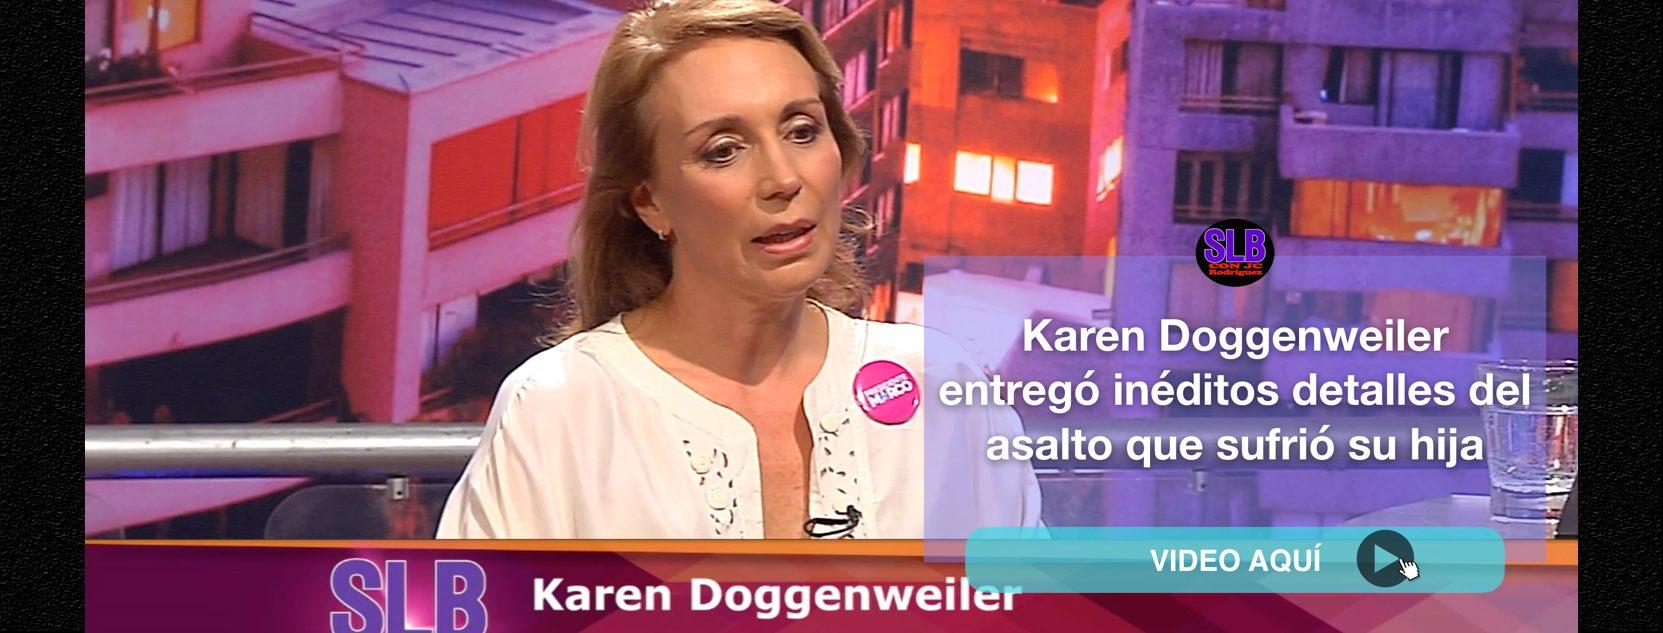 karen-doggenweiler